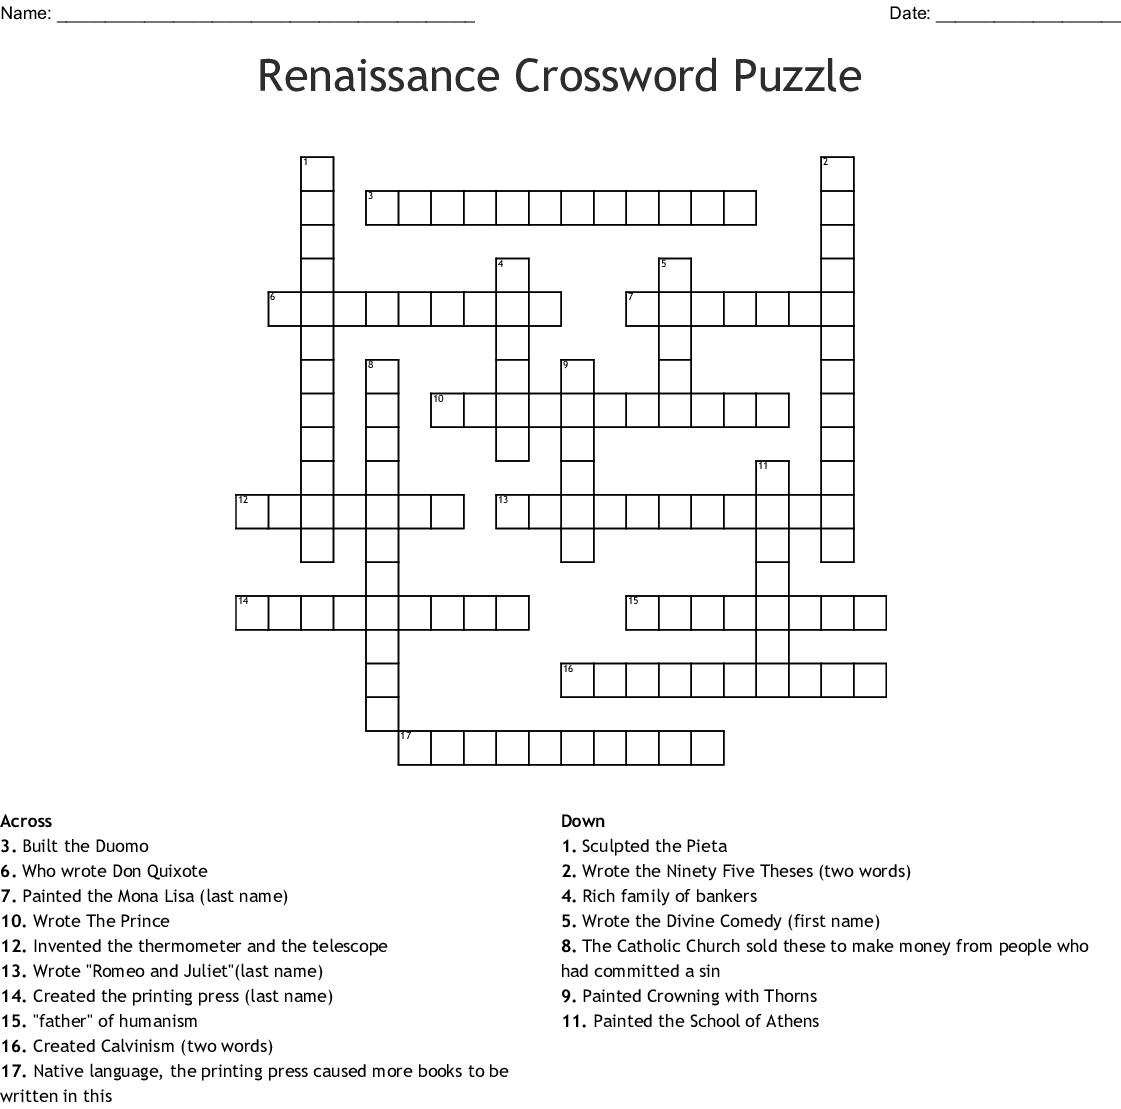 Renaissance Crossword Puzzle Crossword